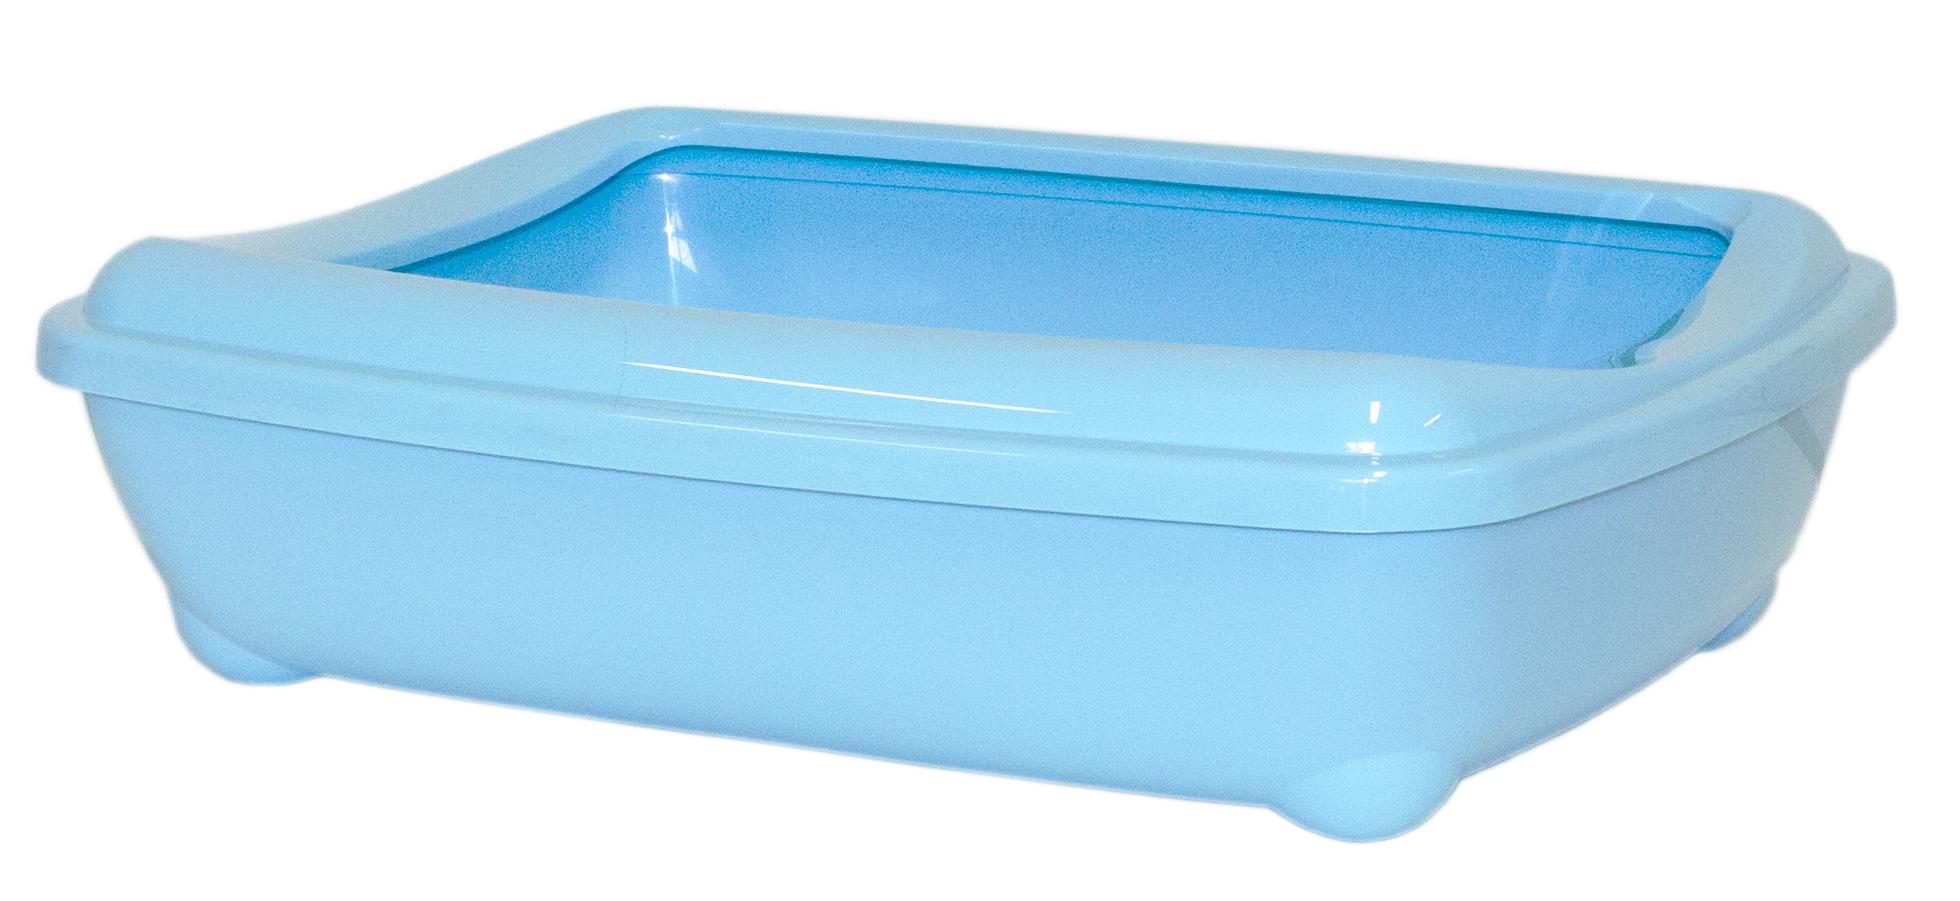 Туалет открытый Moderna Arist-O-Tray, цвет: голубой, 38х50х14 см14C192181